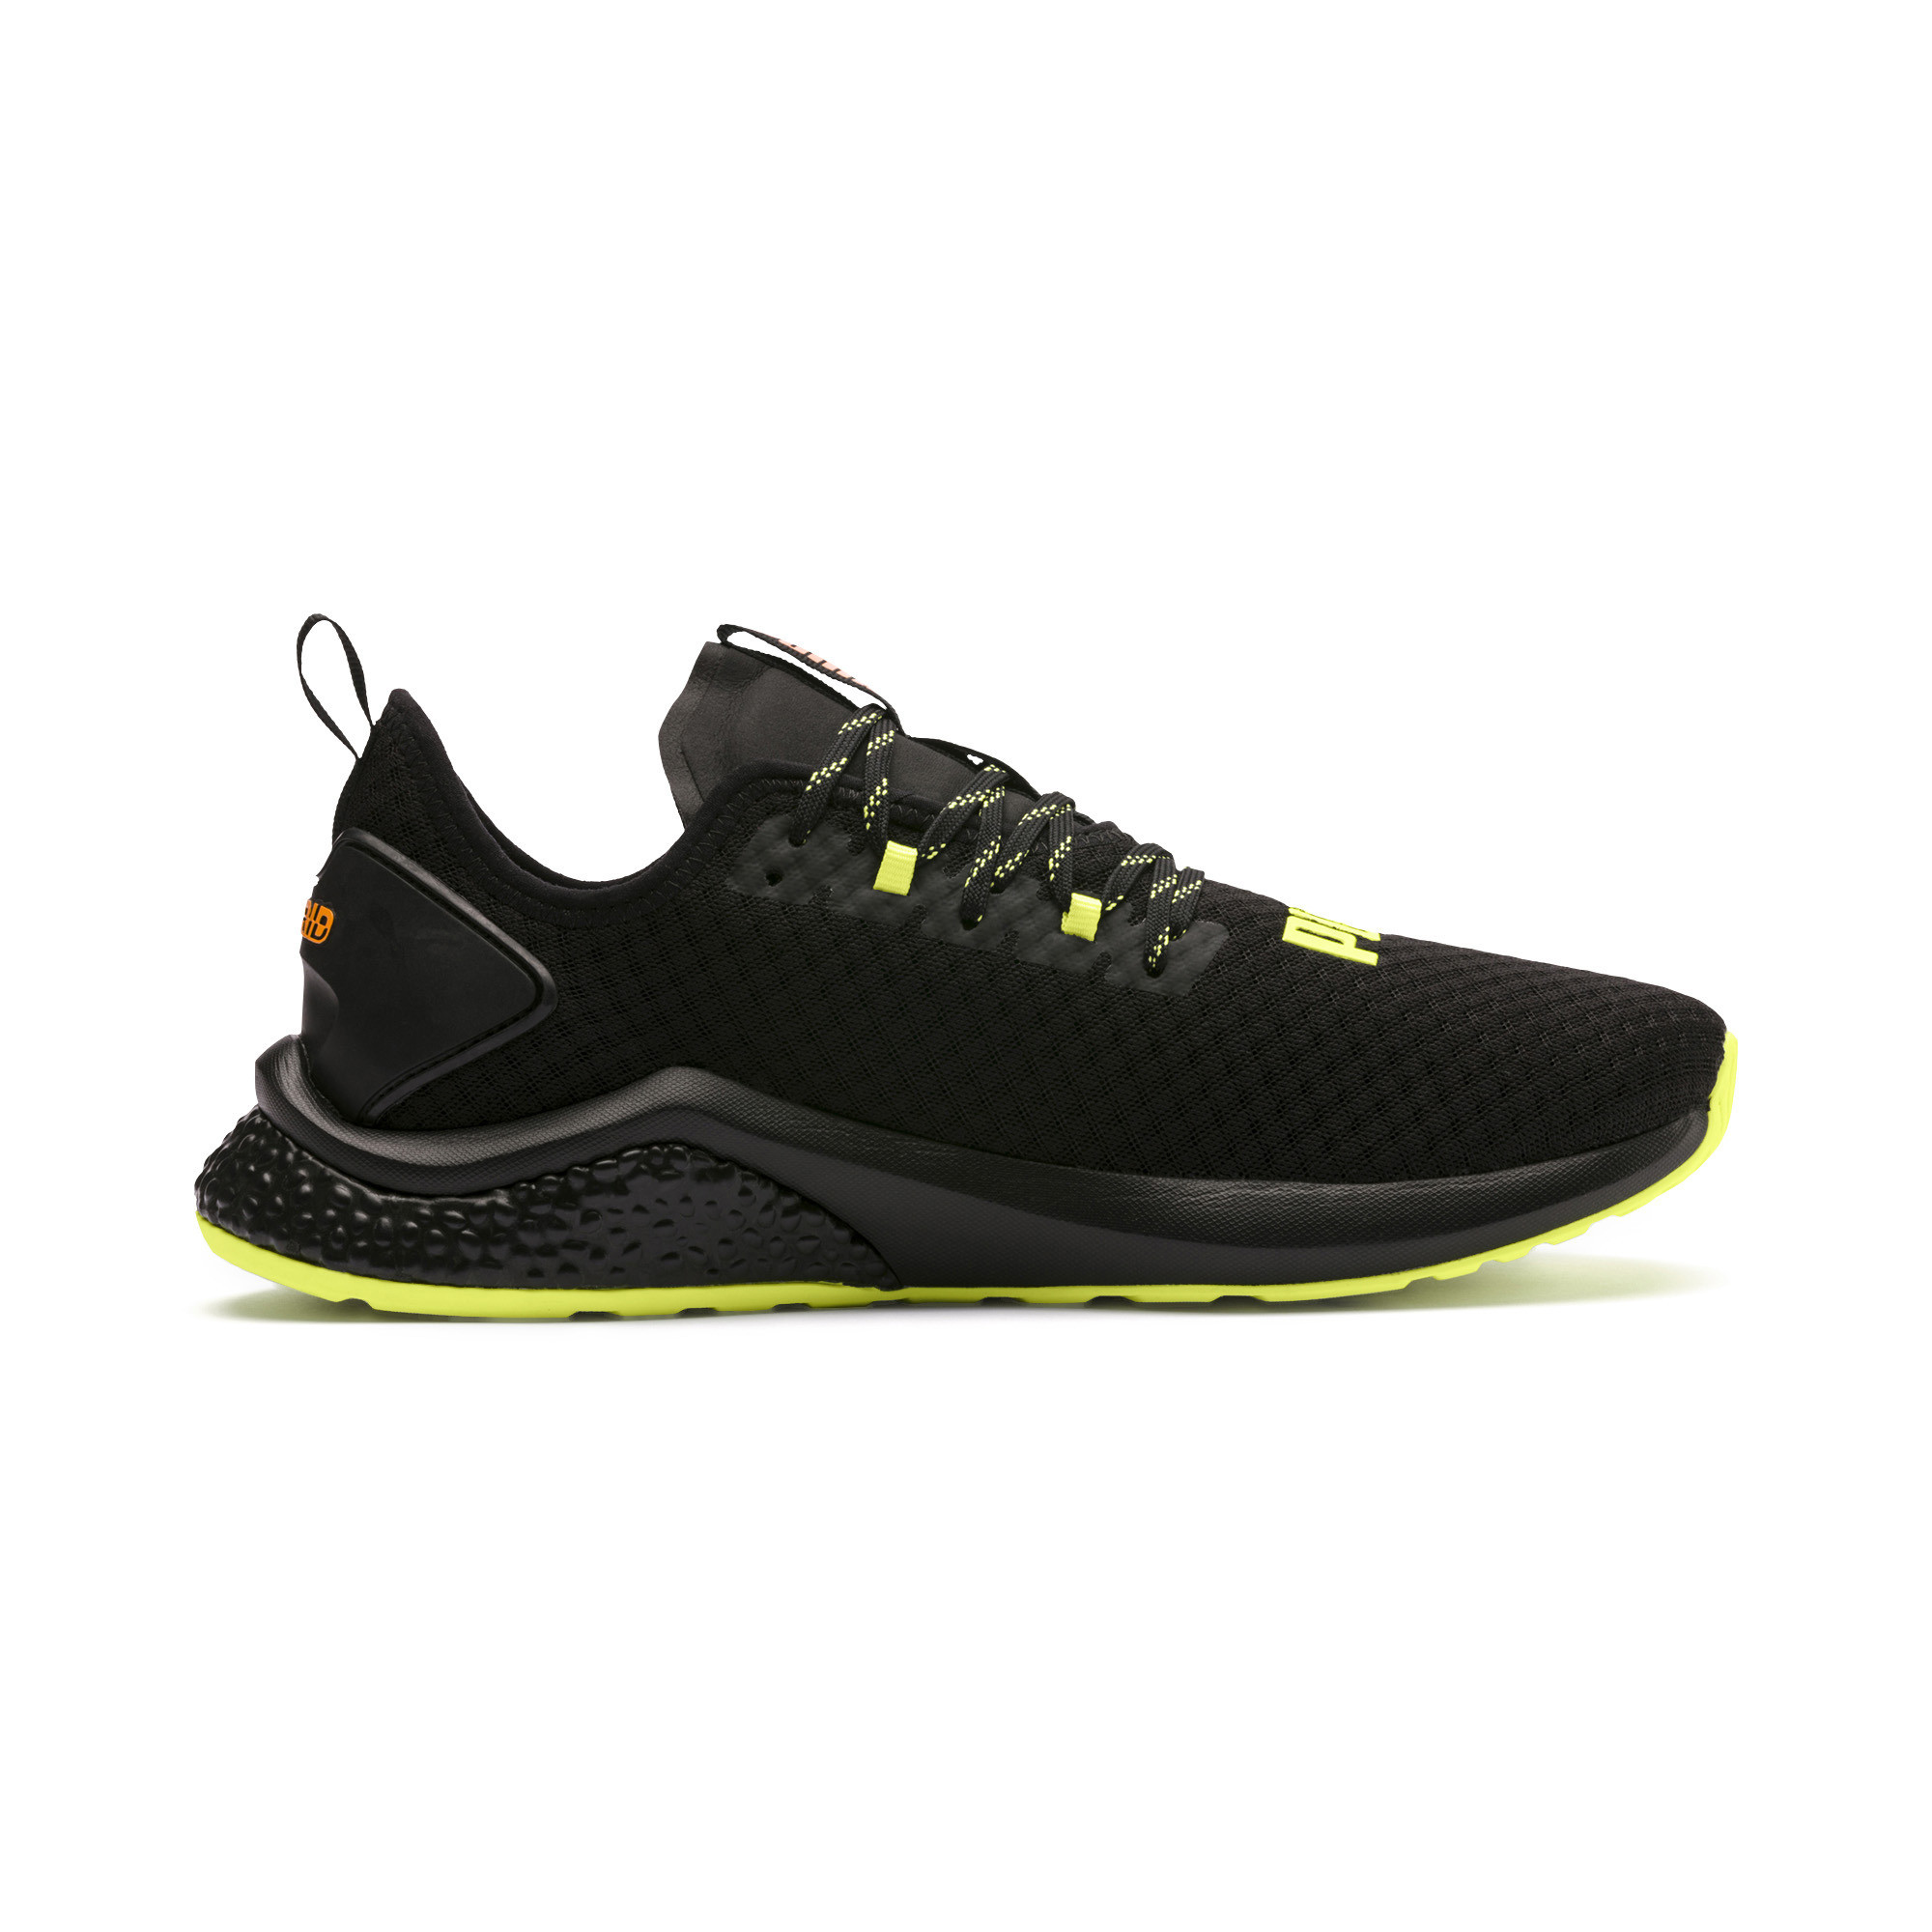 Image Puma HYBRID NX Daylight Men's Sneakers #6